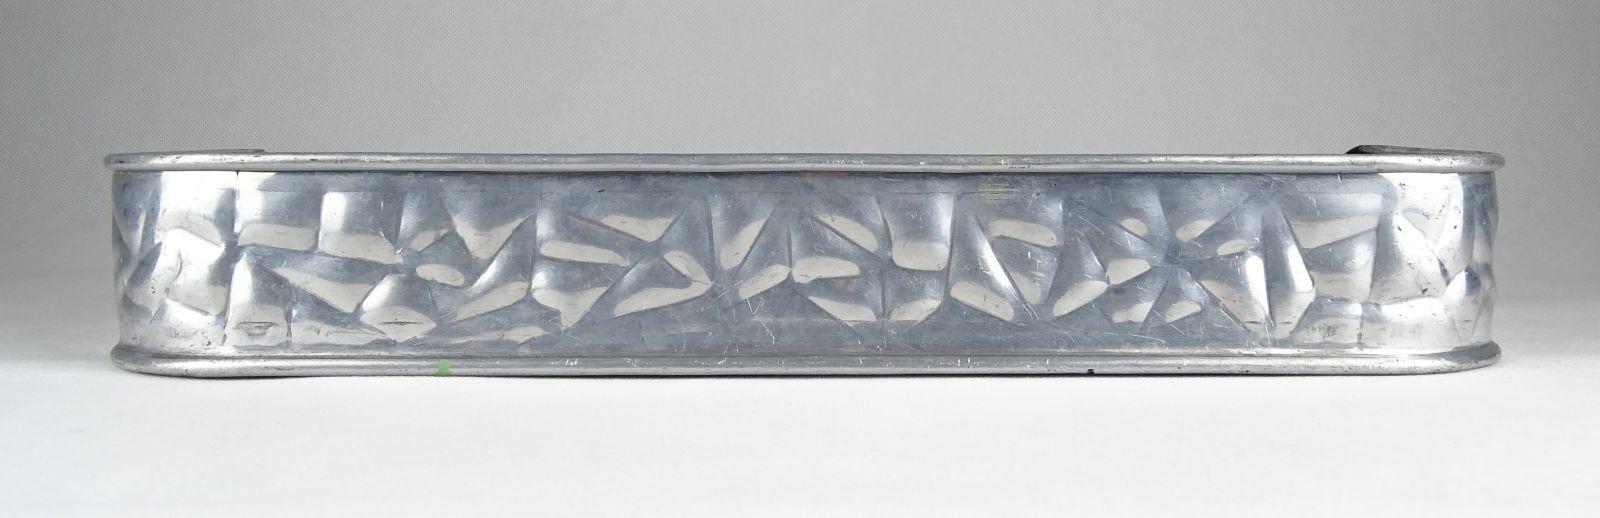 DSC07708.JPG (1600×518)